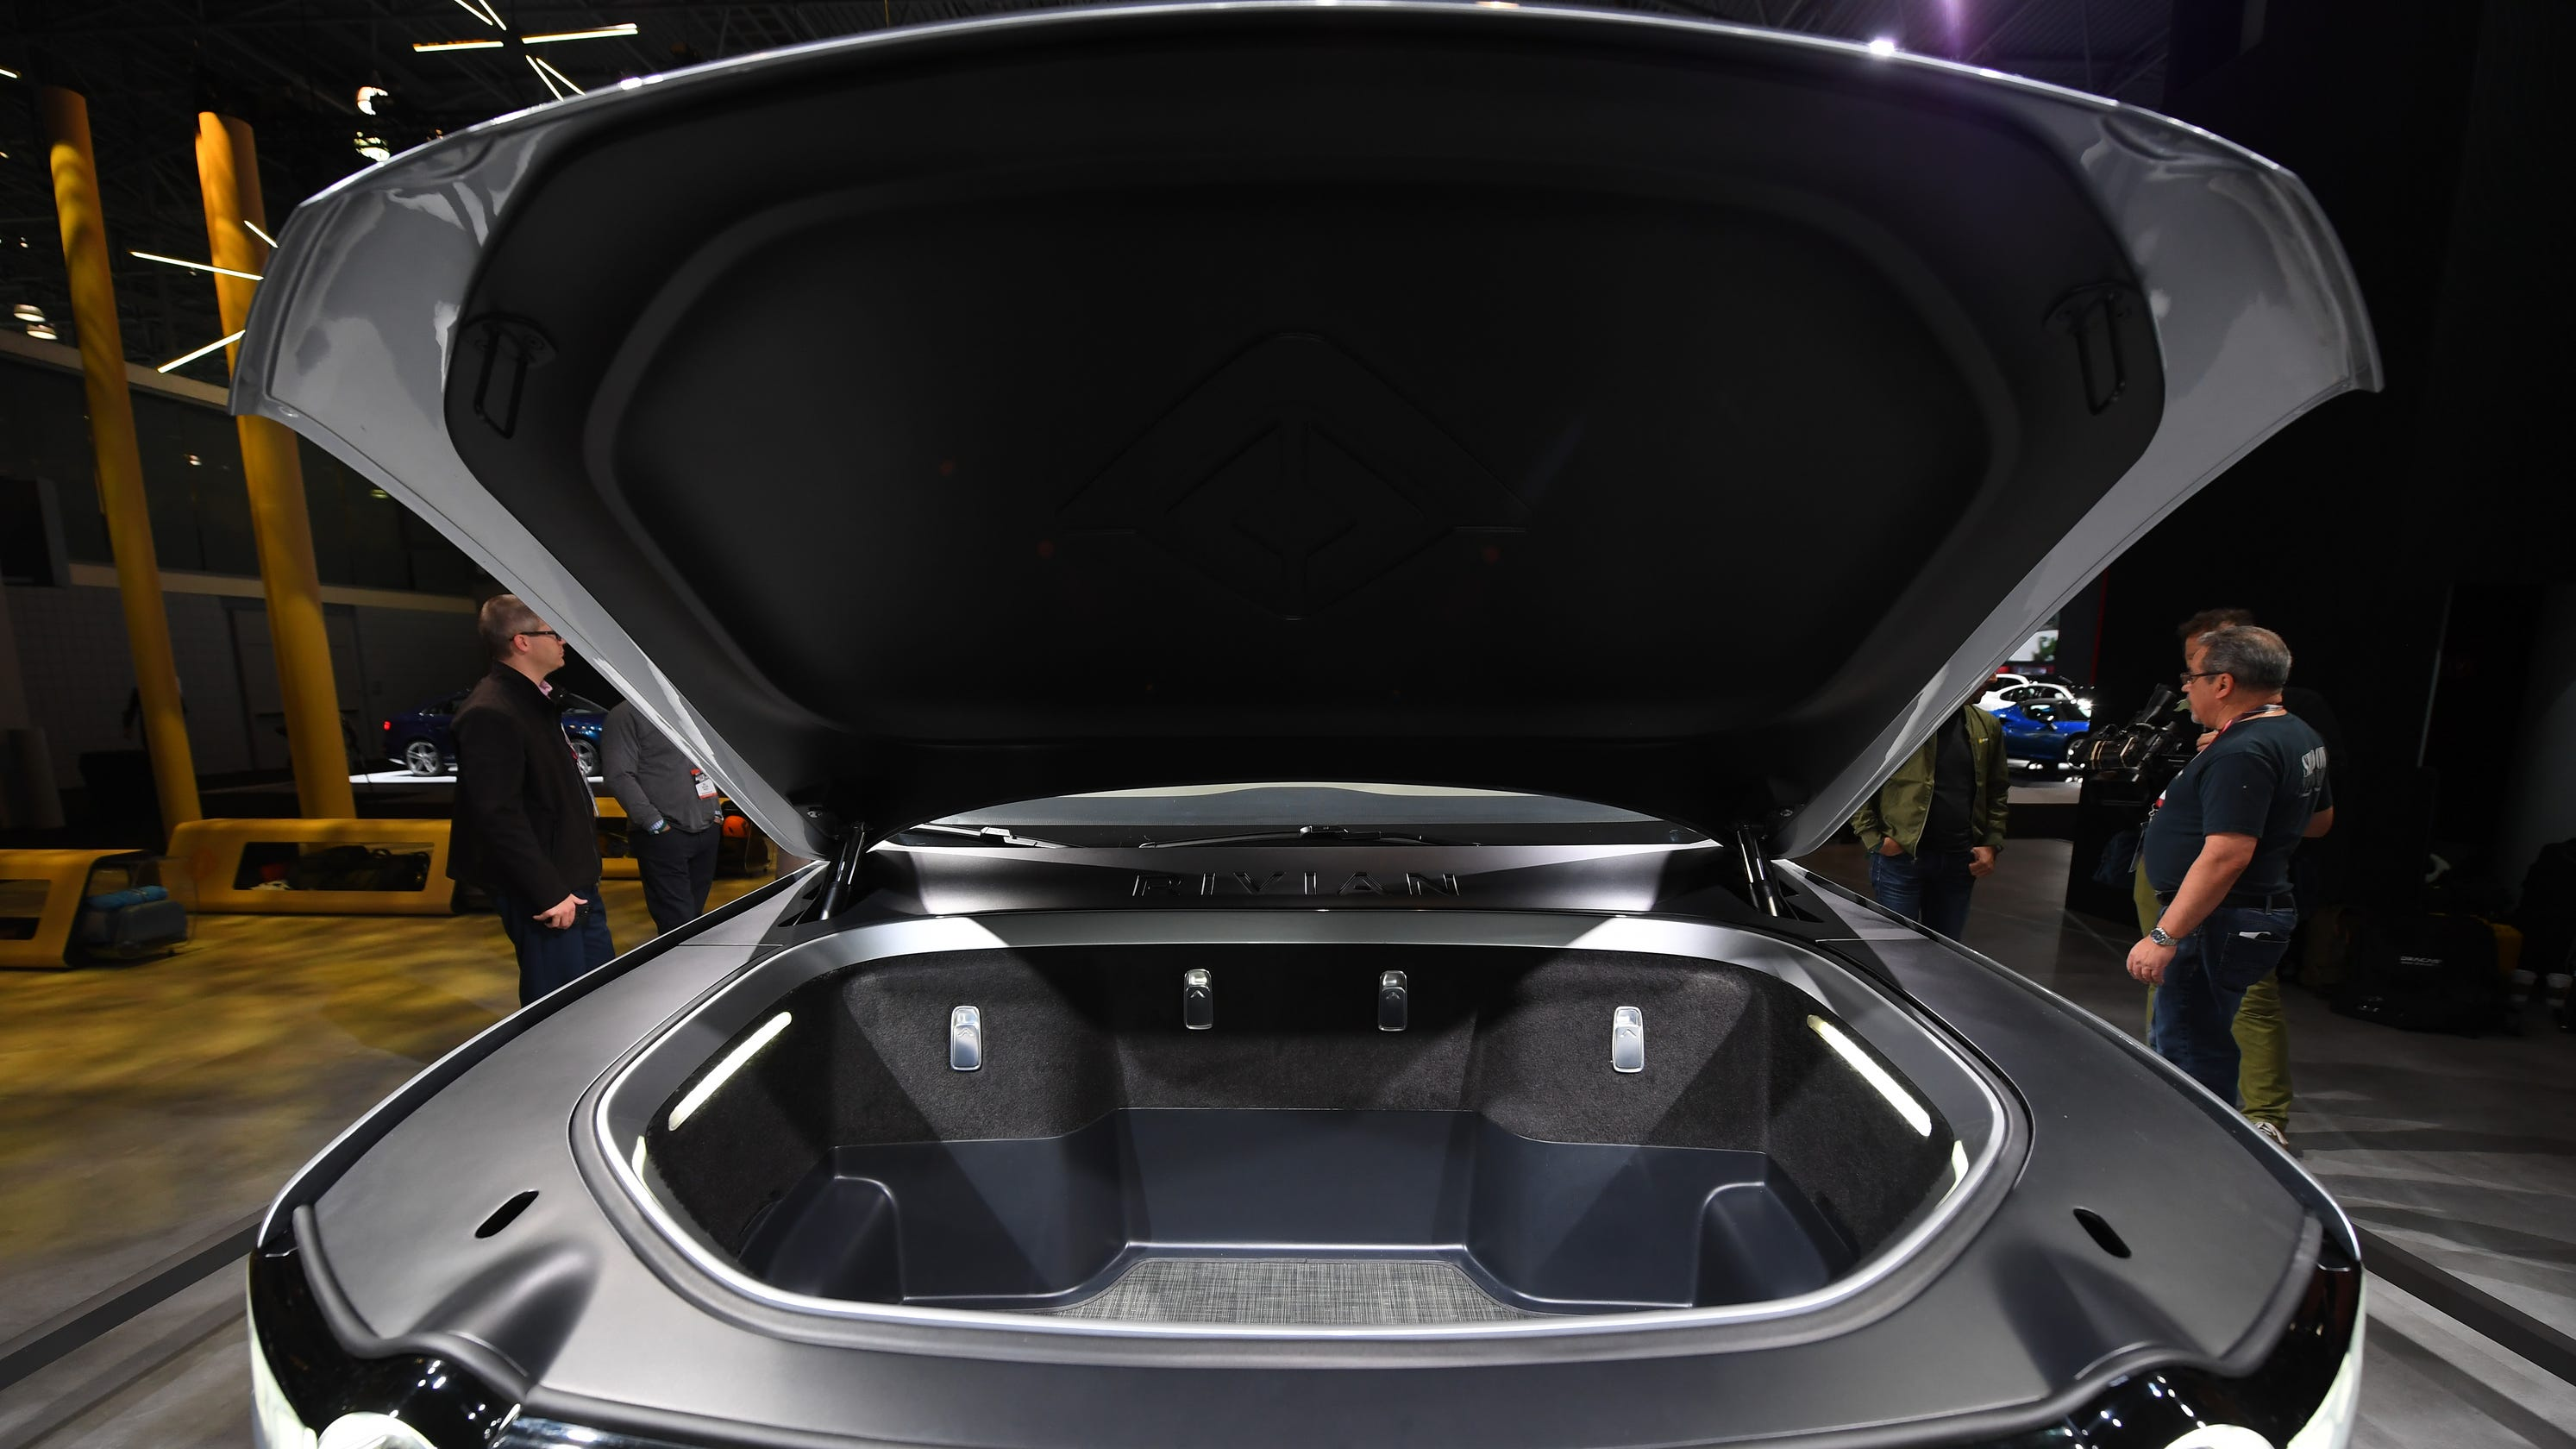 Electric cars like Rivian, Jaguar, Tesla offer new 'frunk